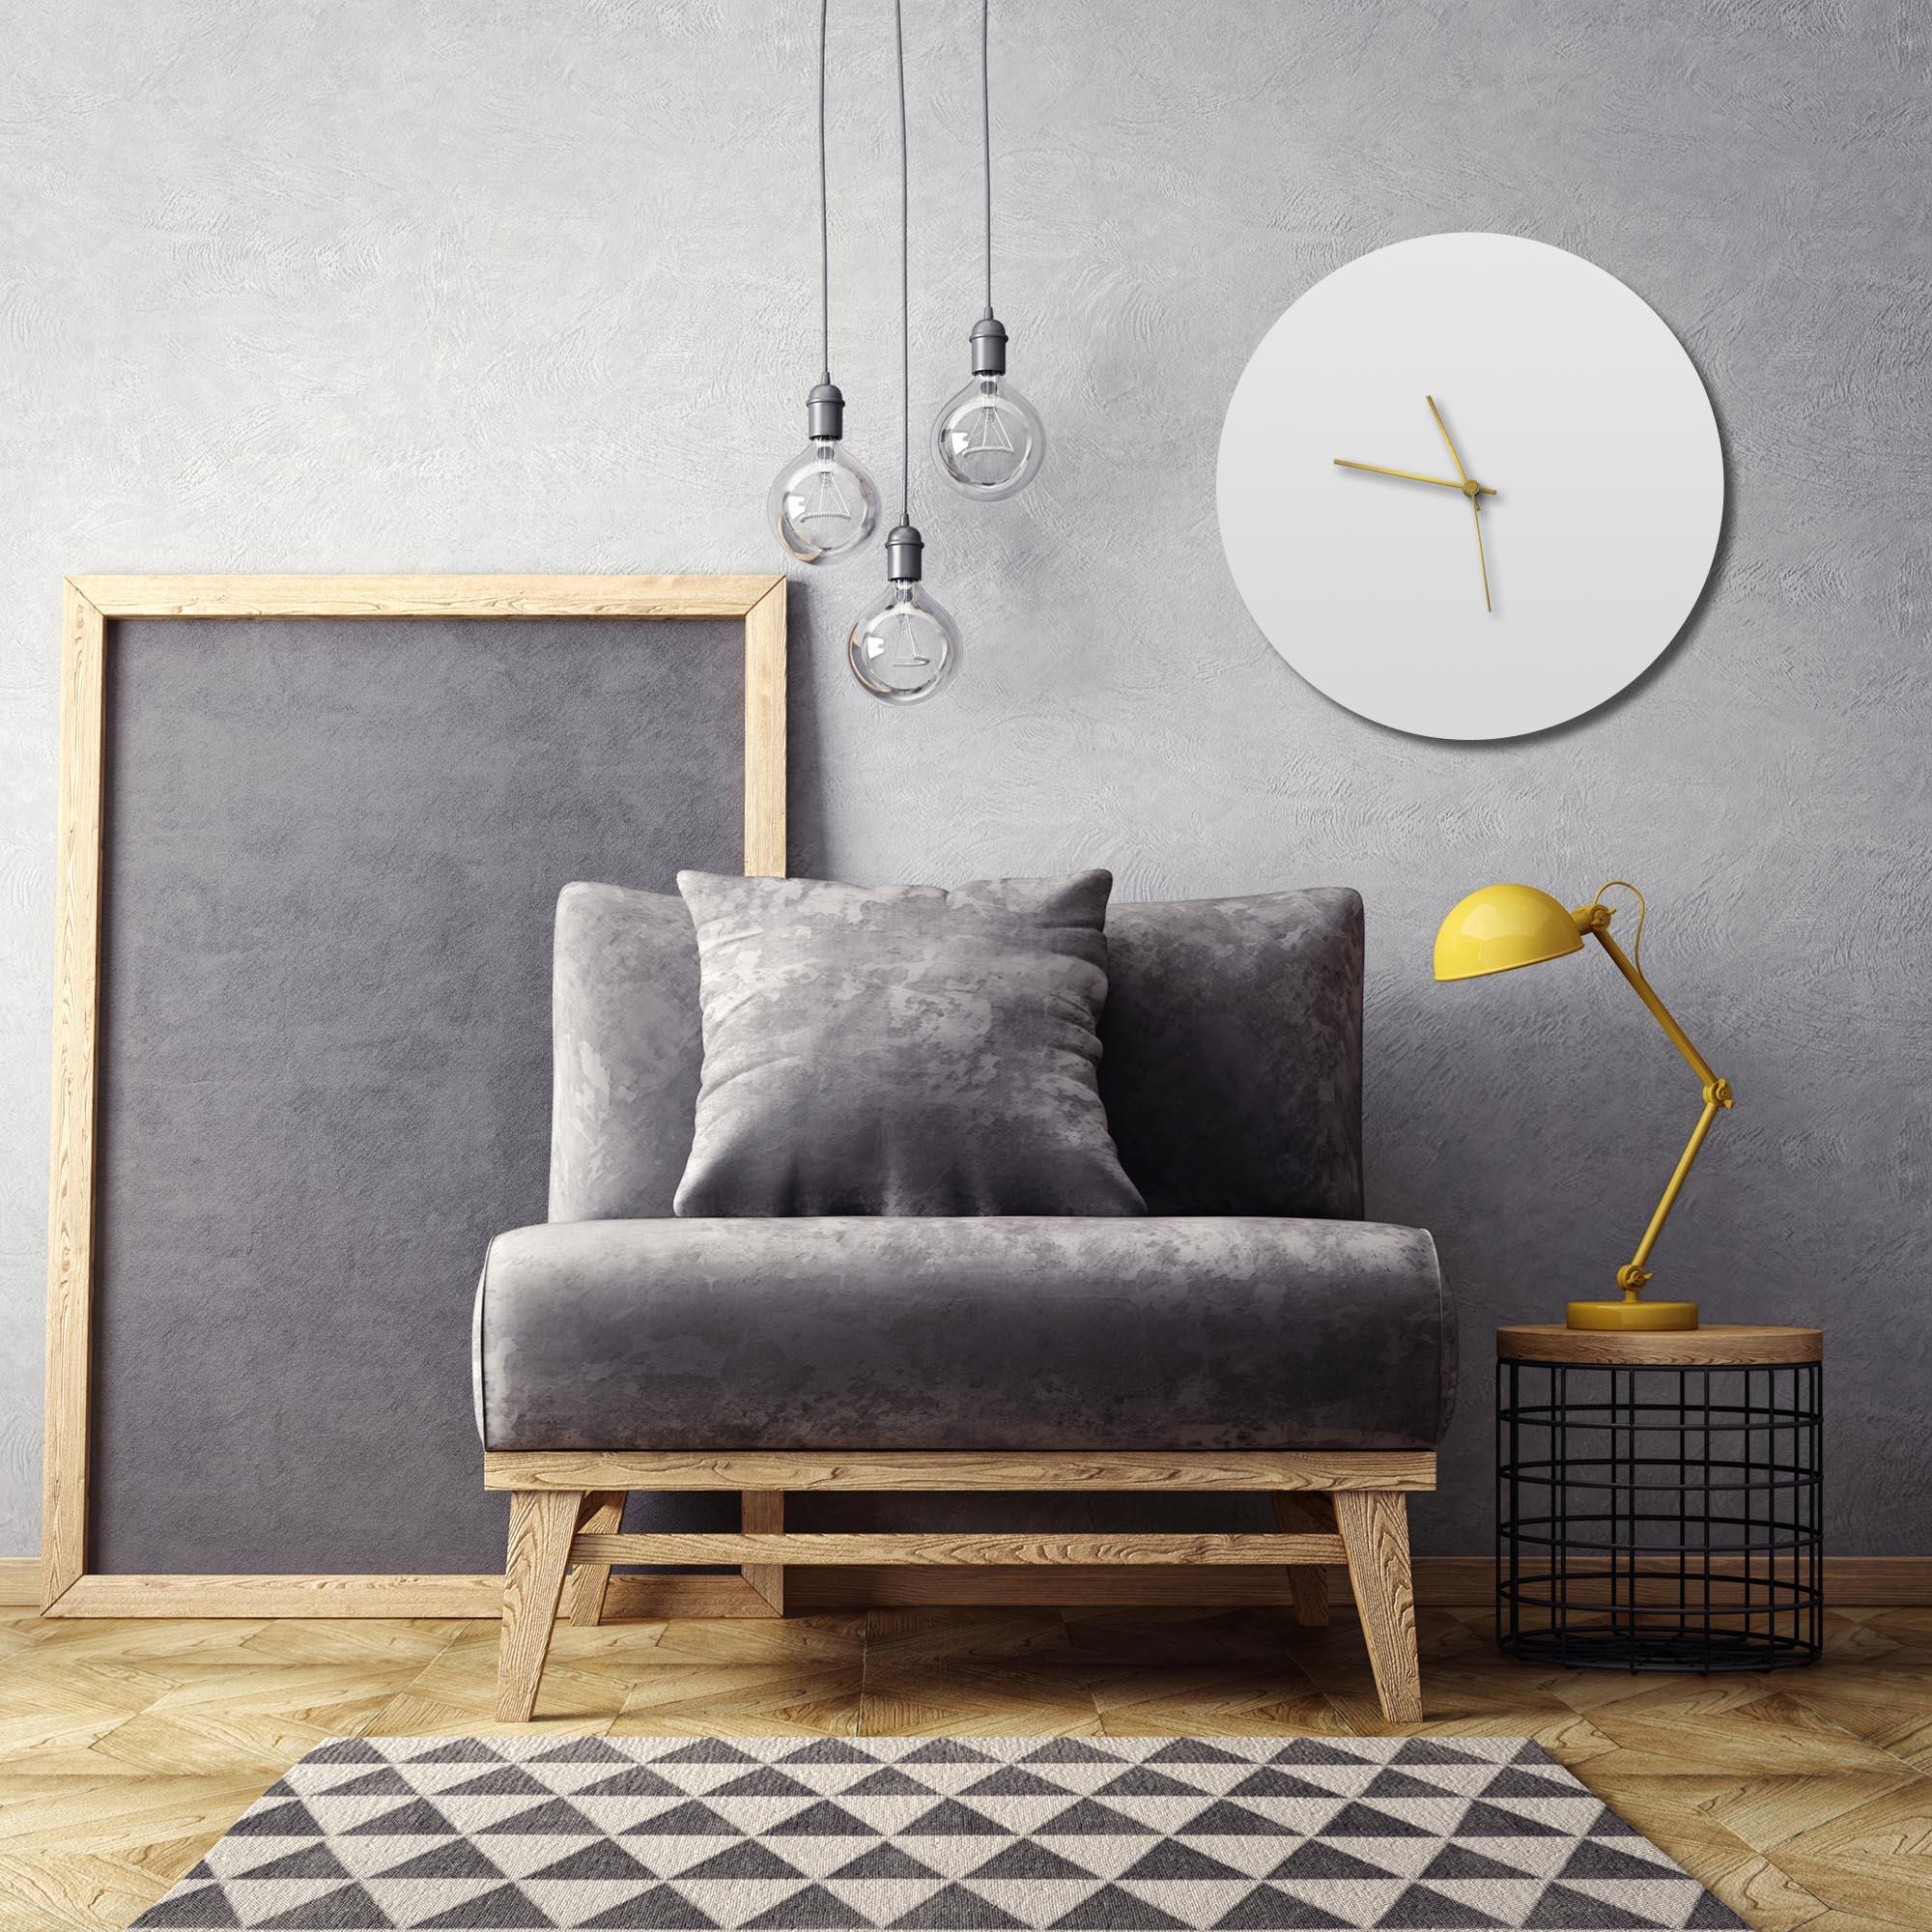 Whiteout Gold Circle Clock Large - Lifestyle View